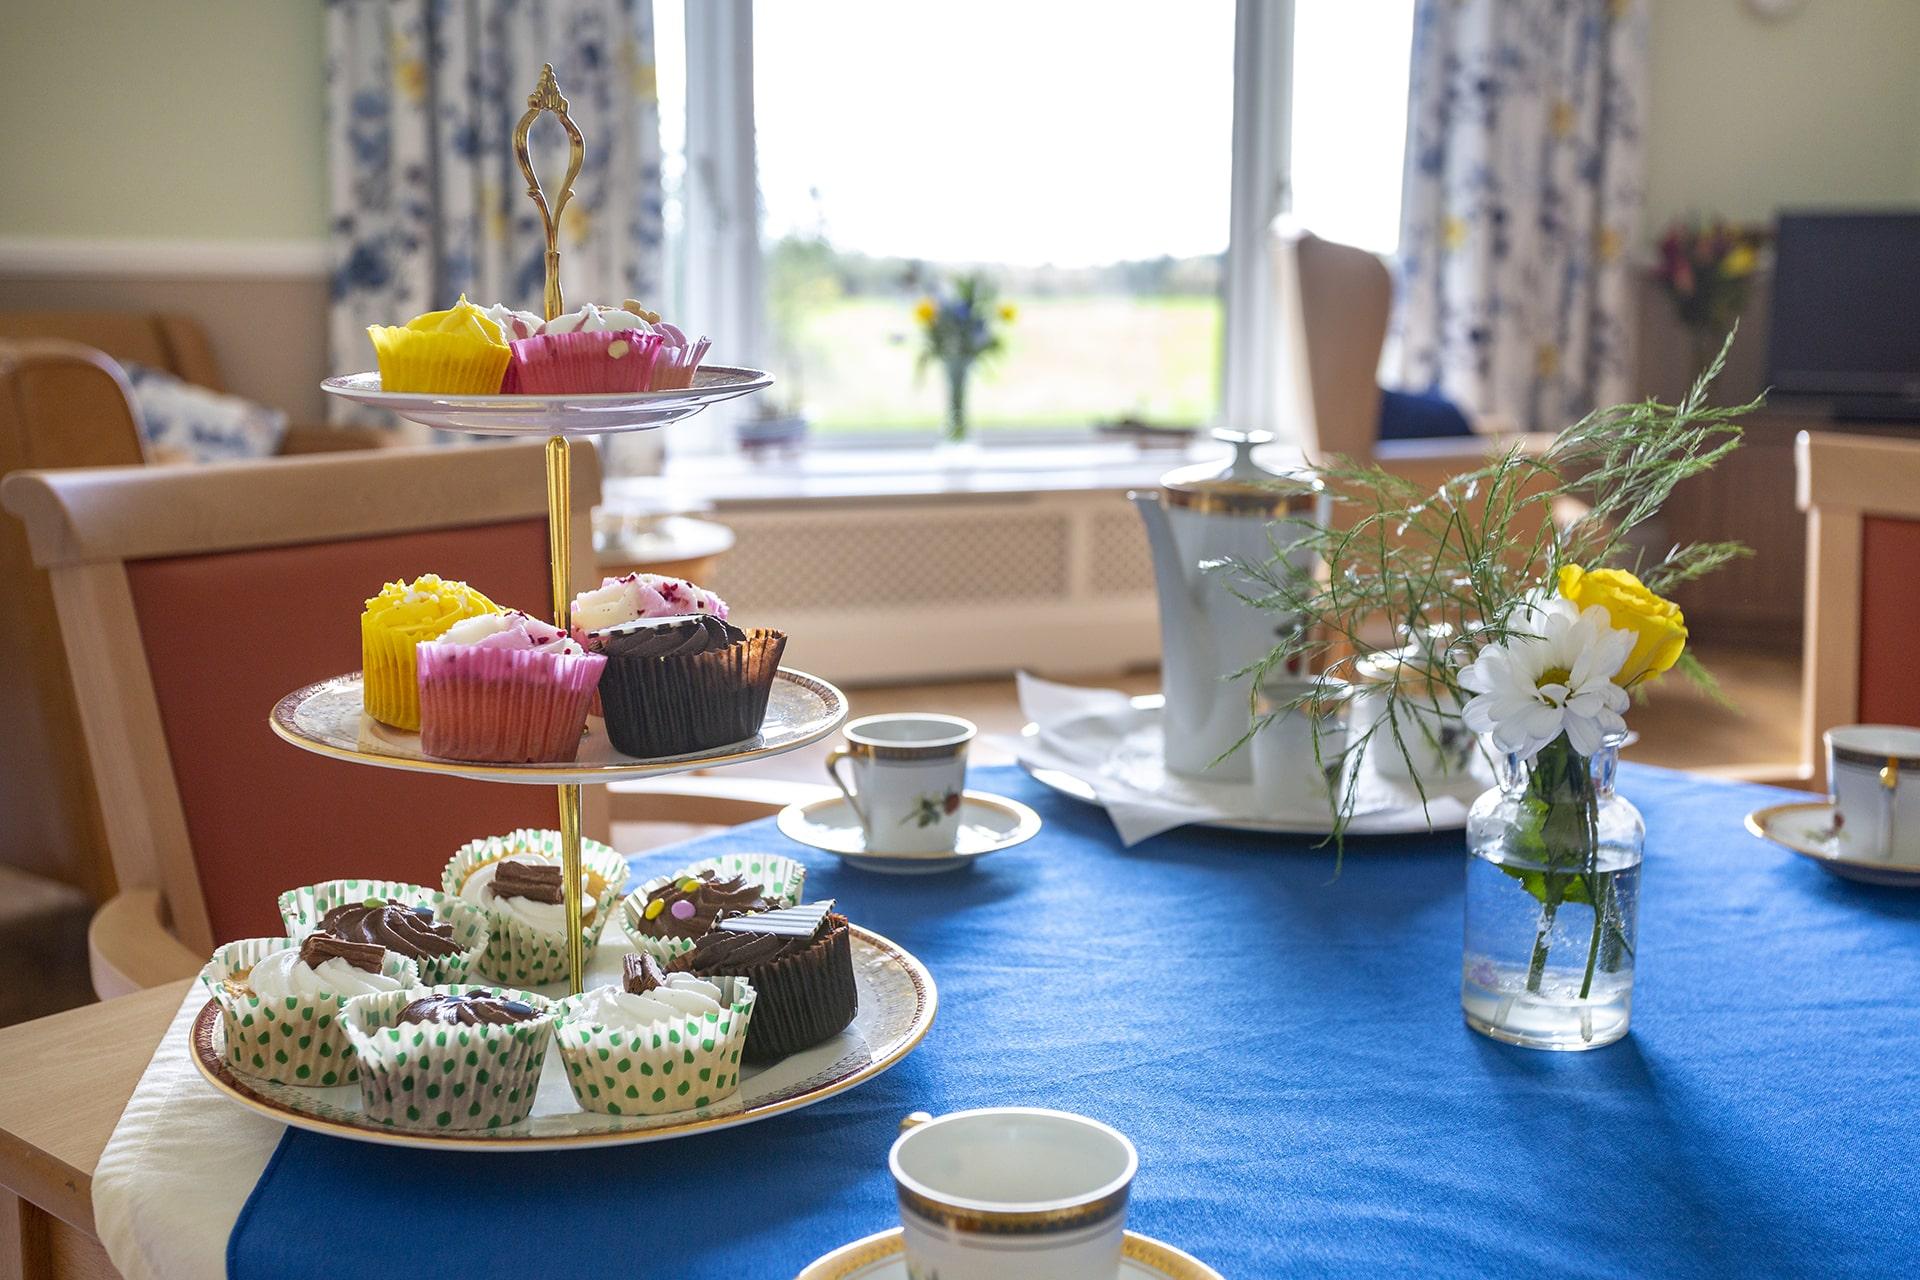 Stambridge Meadows Care Home afternoon tea table